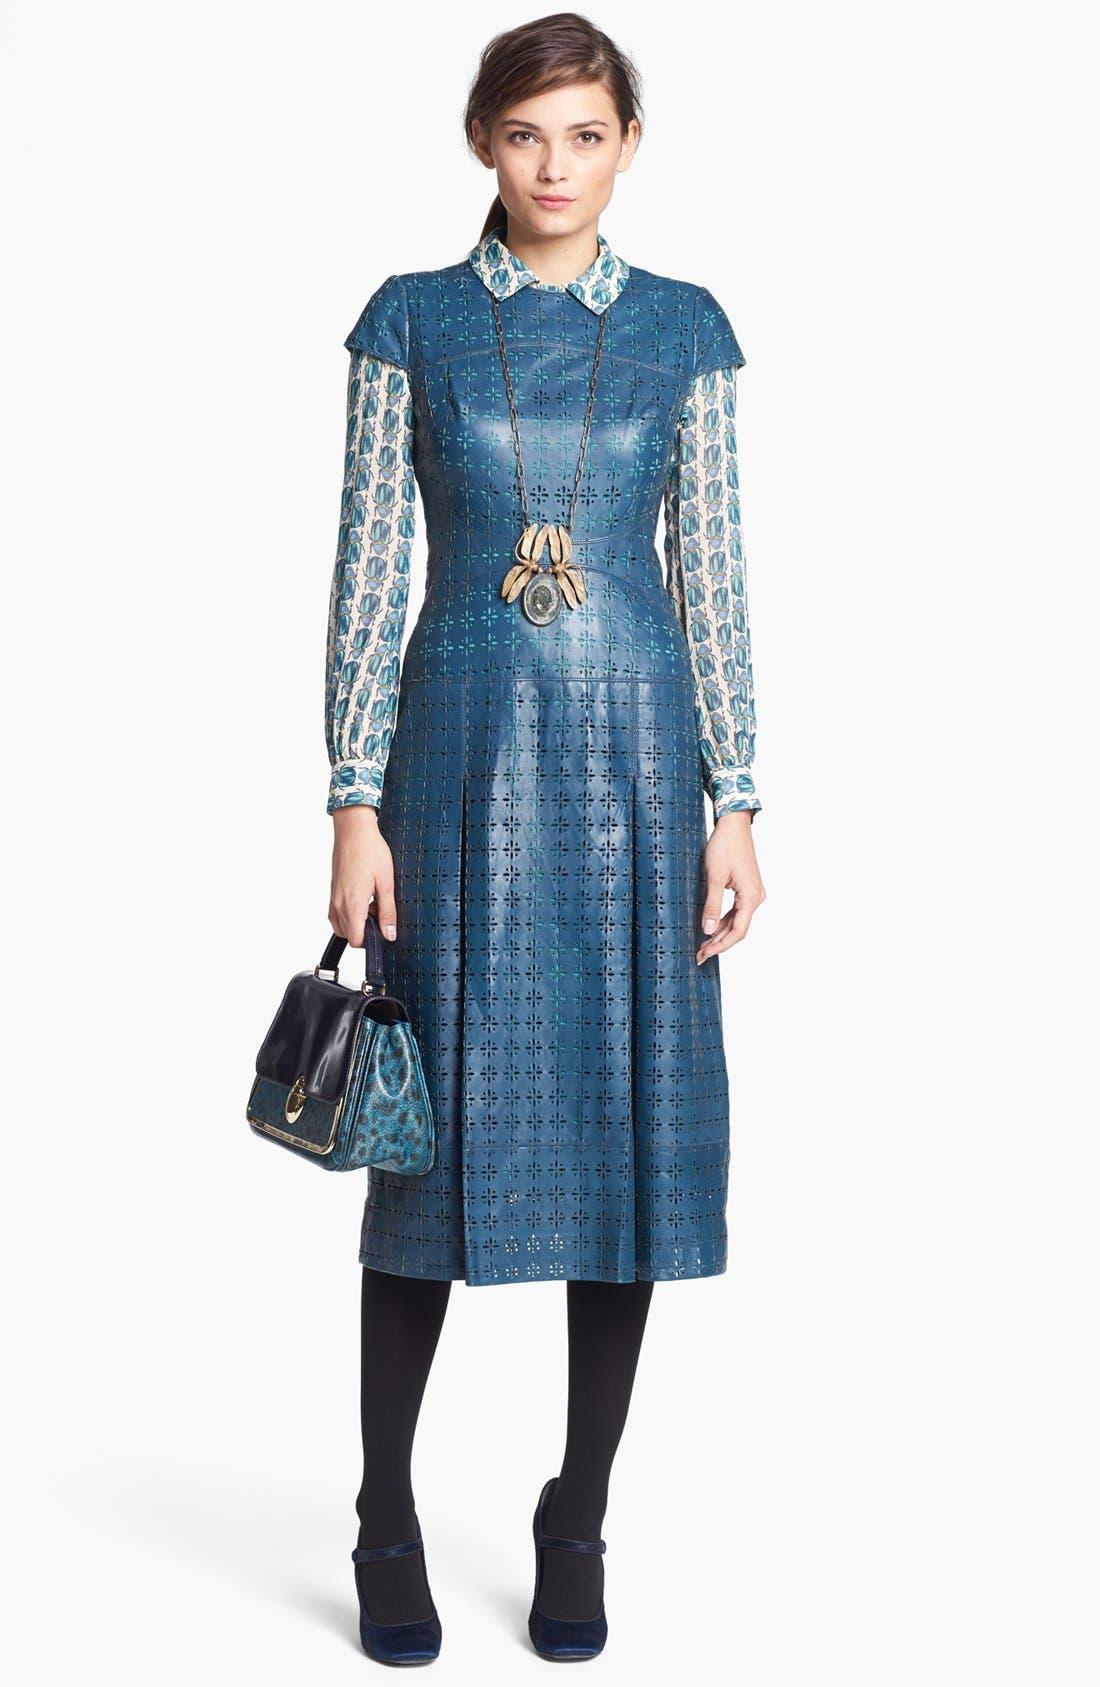 Main Image - Tory Burch 'Collins' Leather Midi Dress